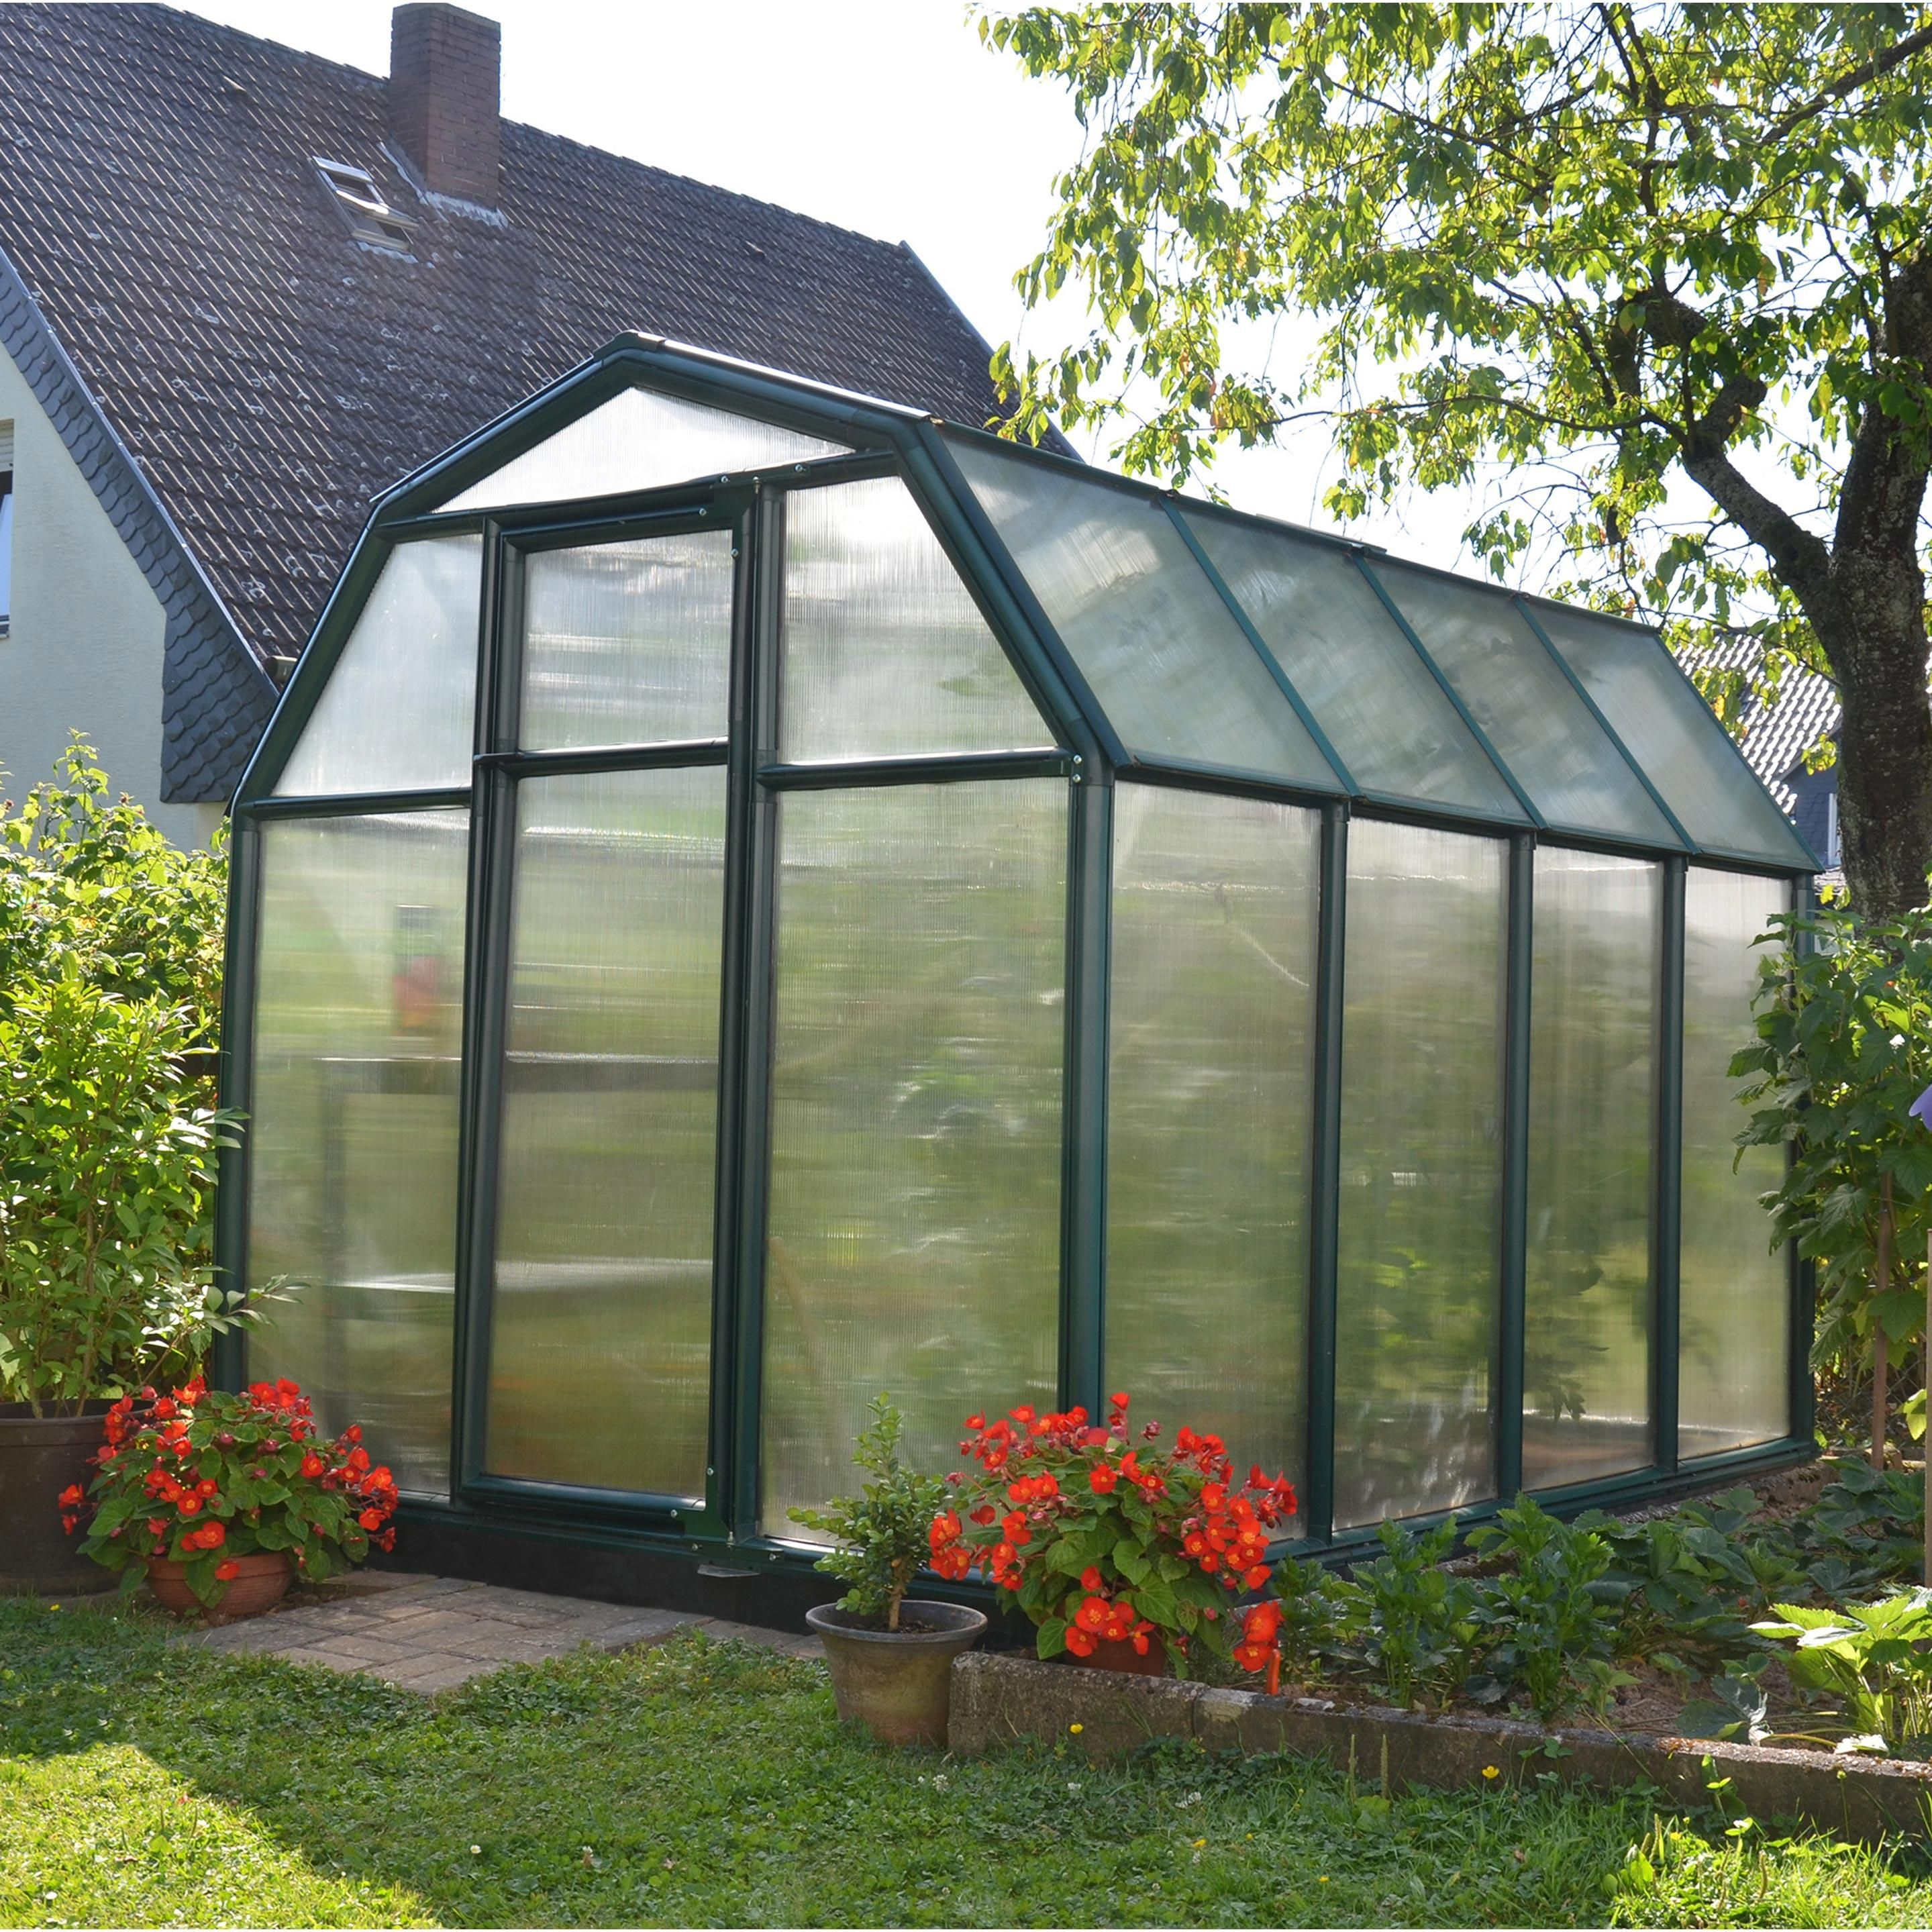 Serre De Jardin Ecogrow 5 1 M Resine Et Polycarbonate Double Parois Palram Serre Jardin Maison Verte Jardins